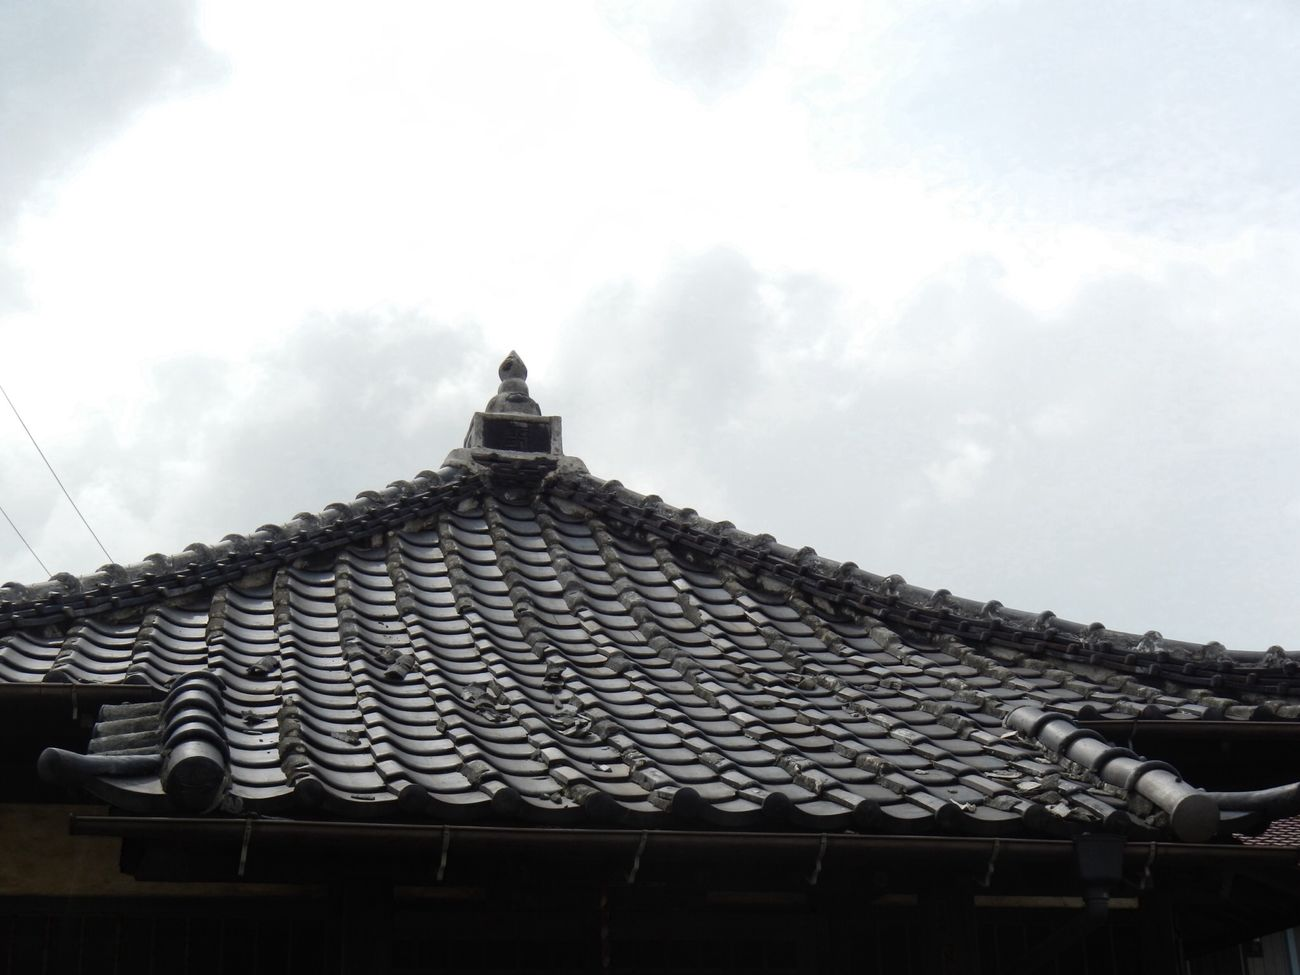 Roof NIKON S800c